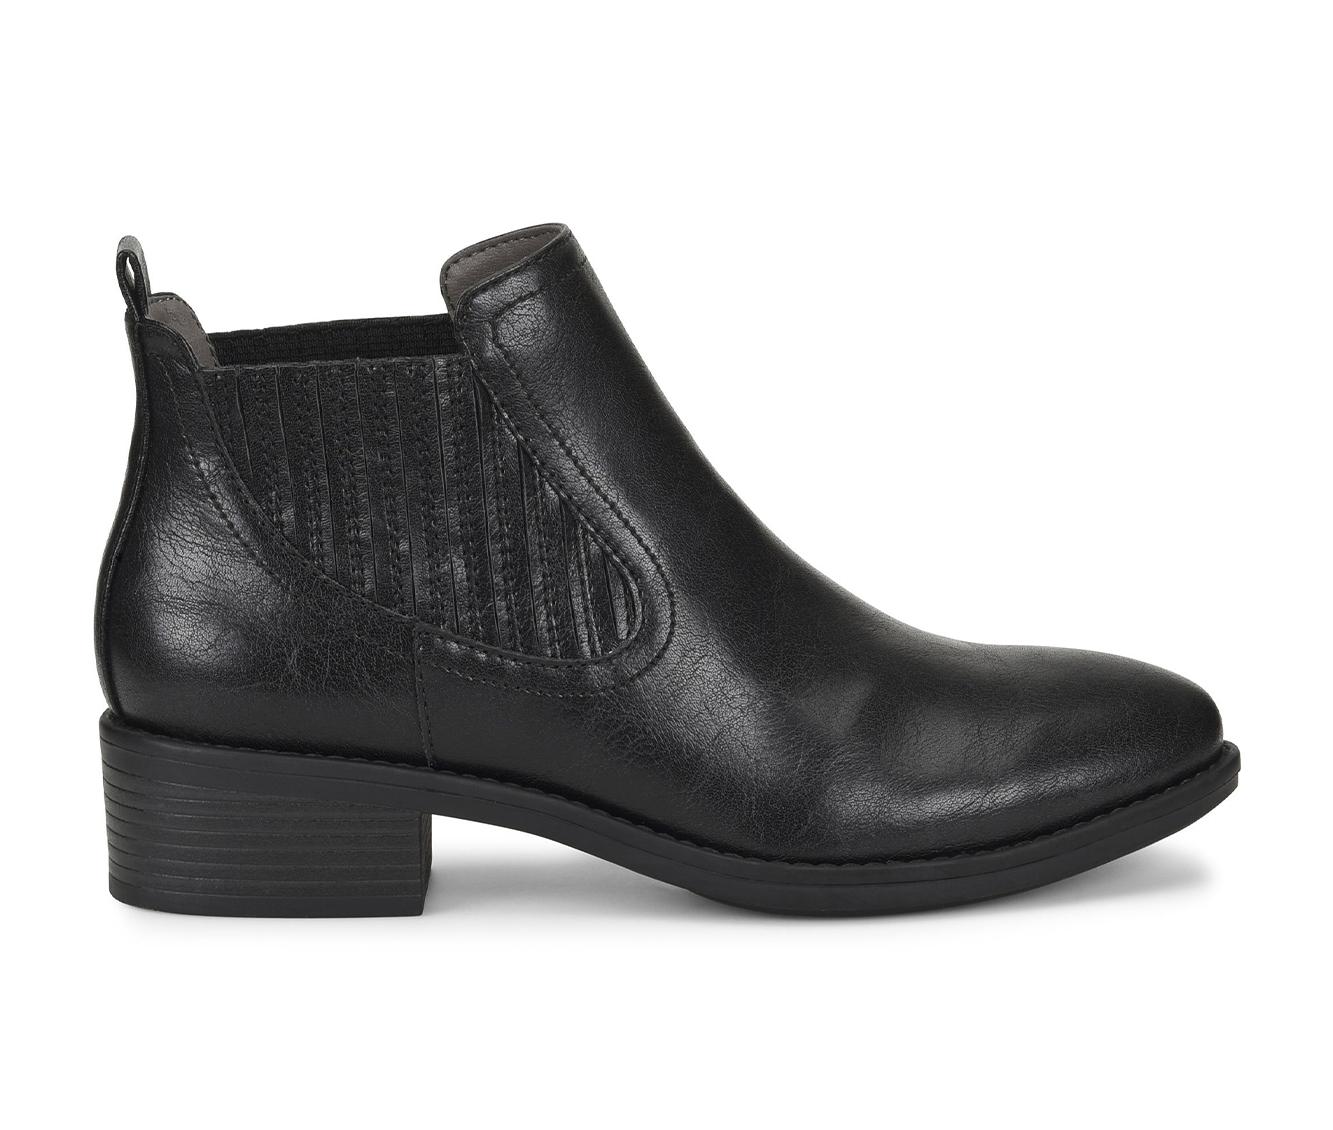 EuroSoft Colisa Women's Boot (Black Faux Leather)